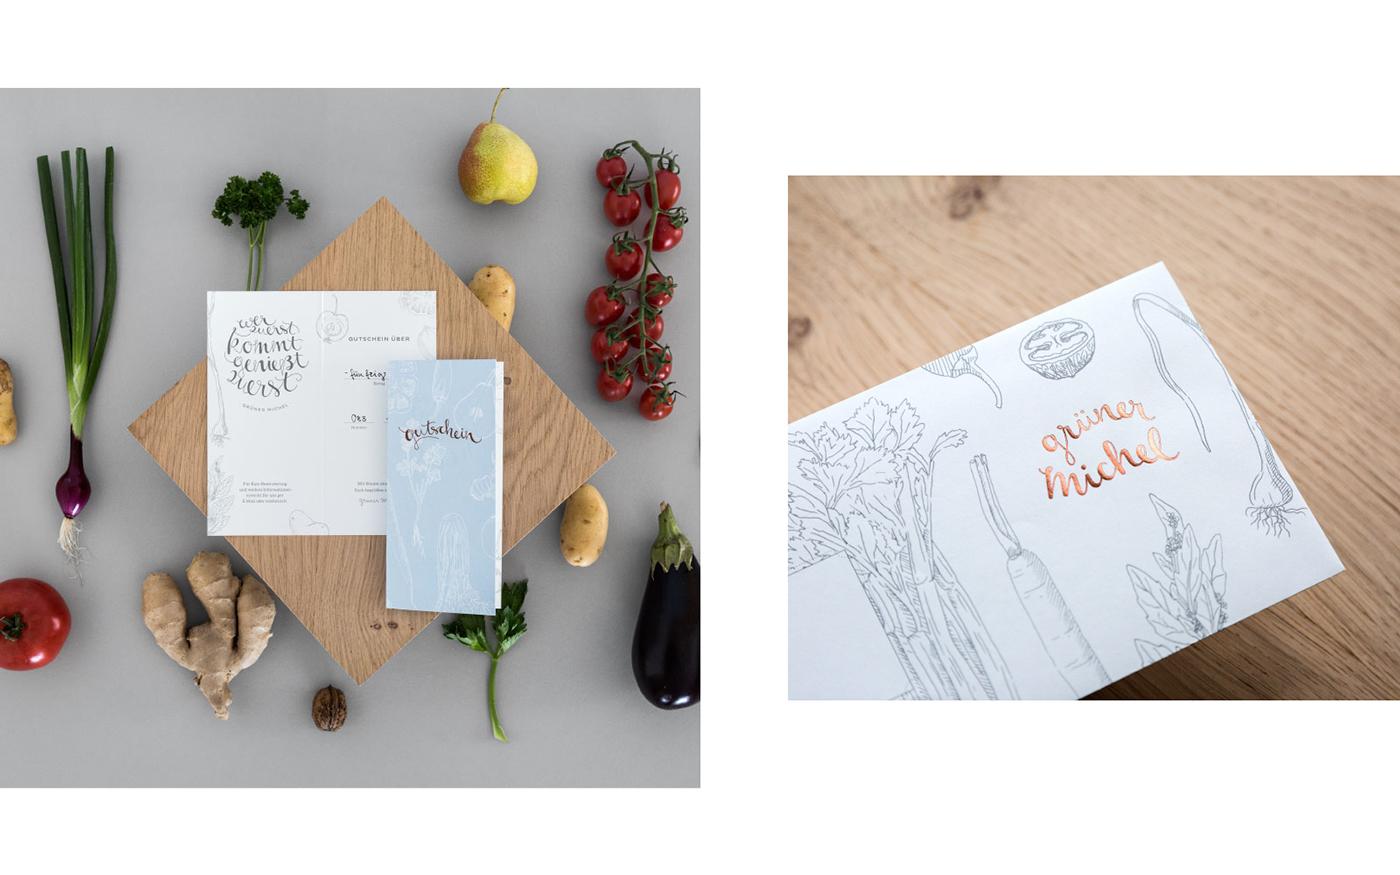 Gruener Michel-branding-interior design-hisheji (2)